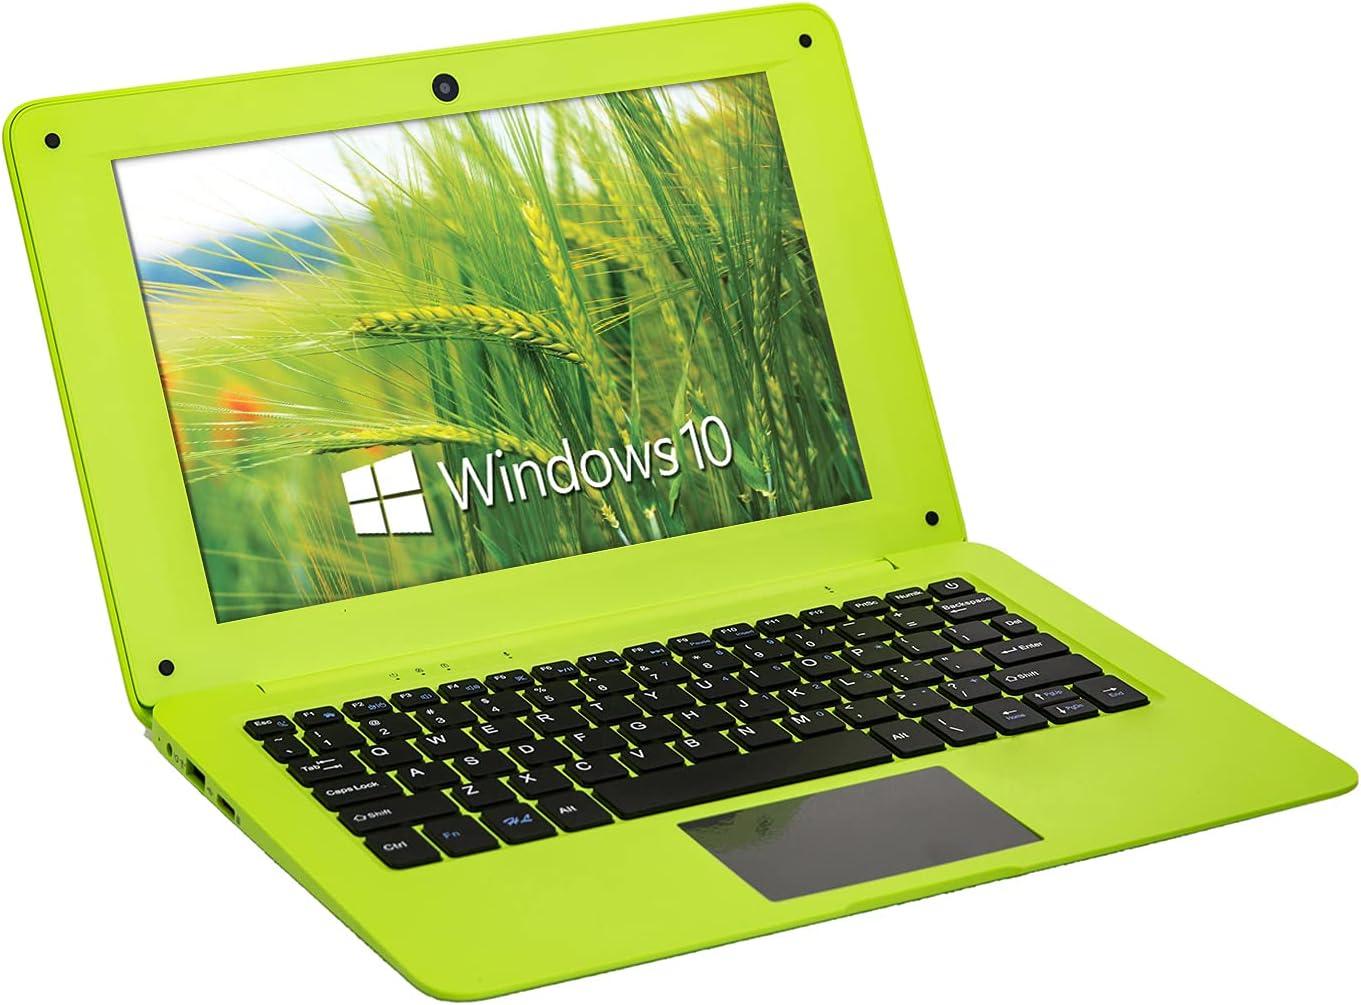 Goldengulf Windows 10 Portable Computer Laptop Mini 10.1 Inch 32GB Ultra Slim and Light Netbook Intel Quad Core PC HDMI USB Netflix YouTube for Children (Green)